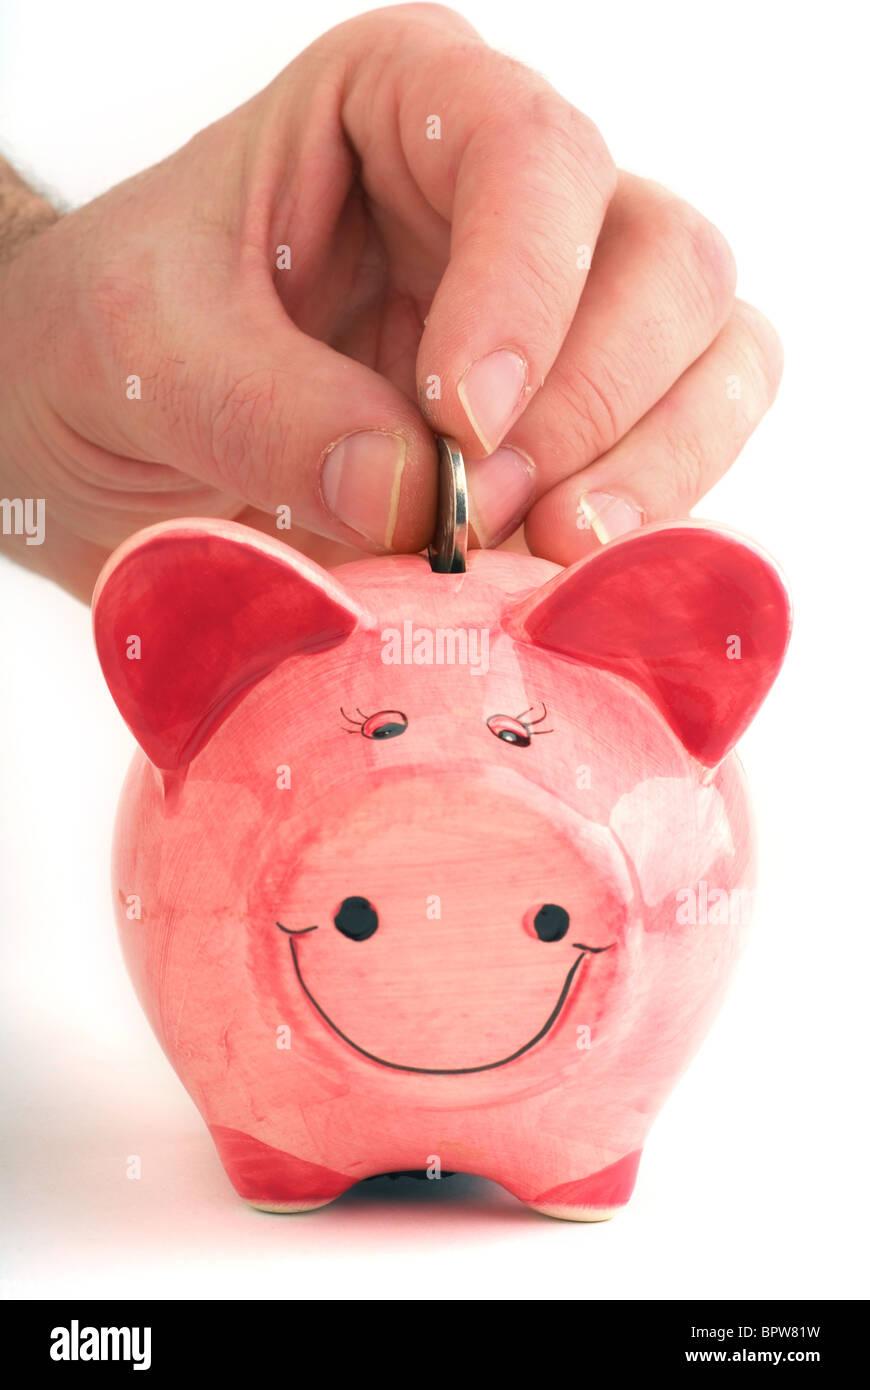 Filling up piggy bank studio isolated on white background - Stock Image